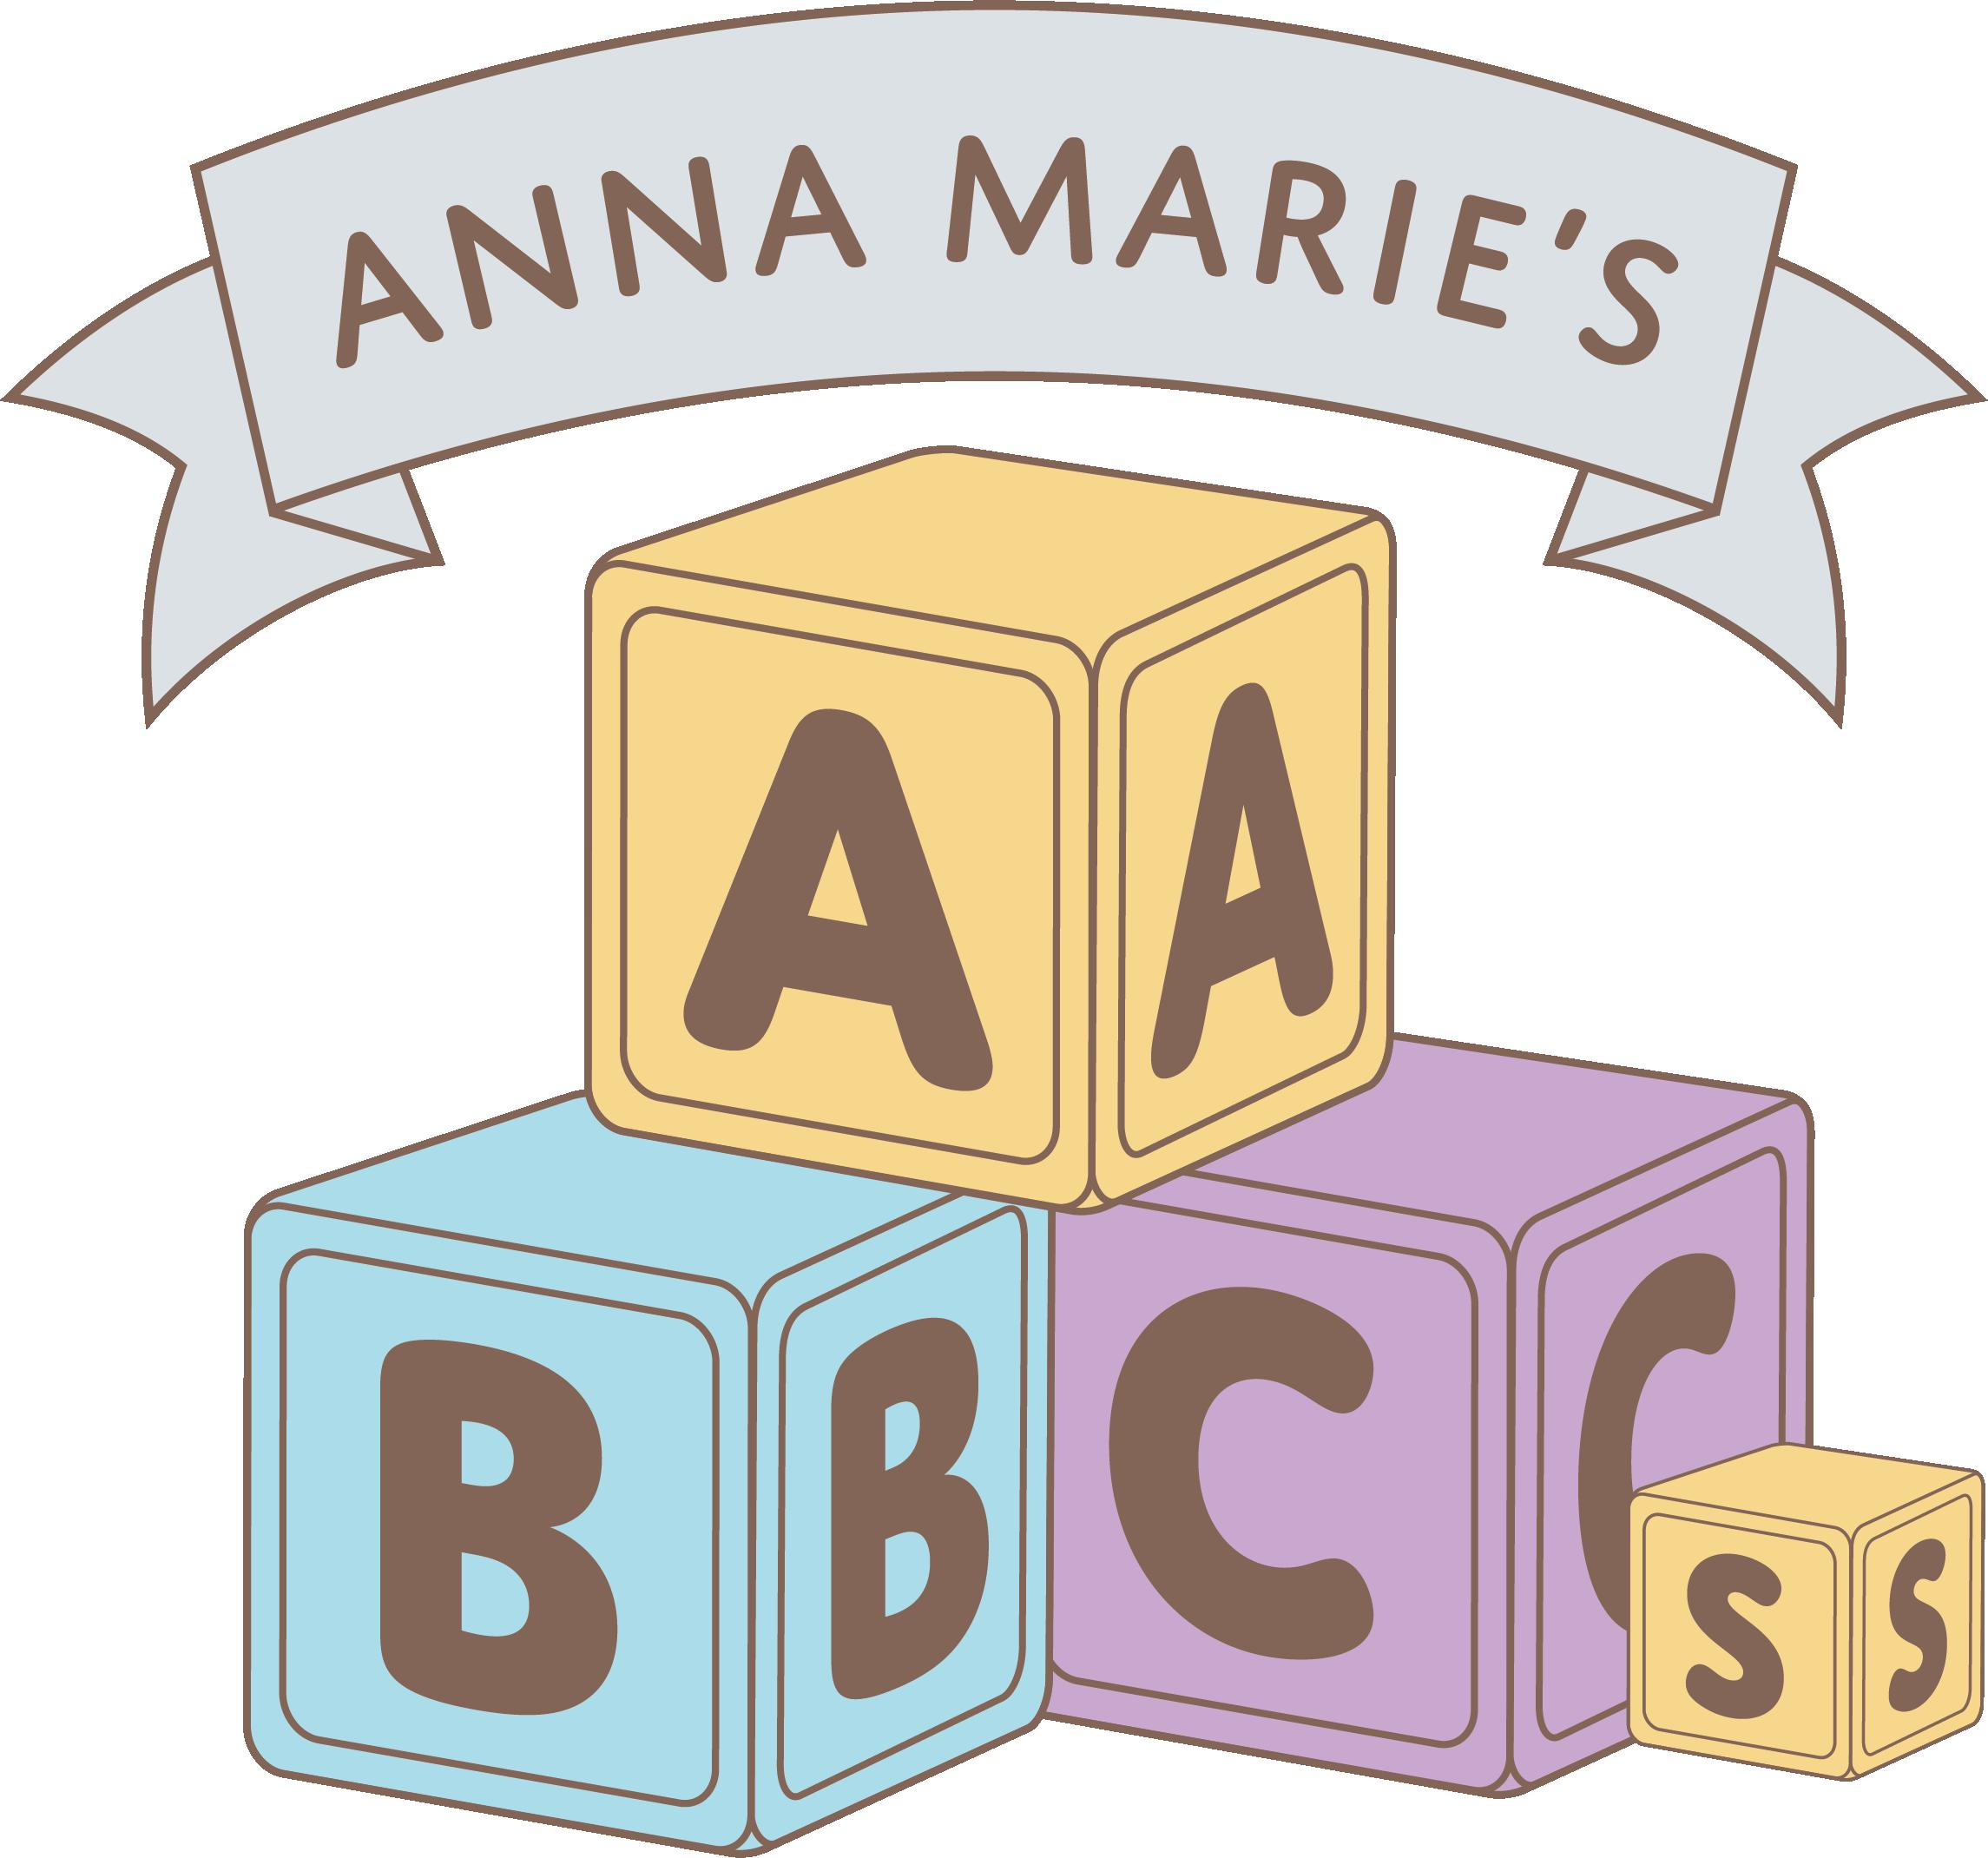 My ABC Name